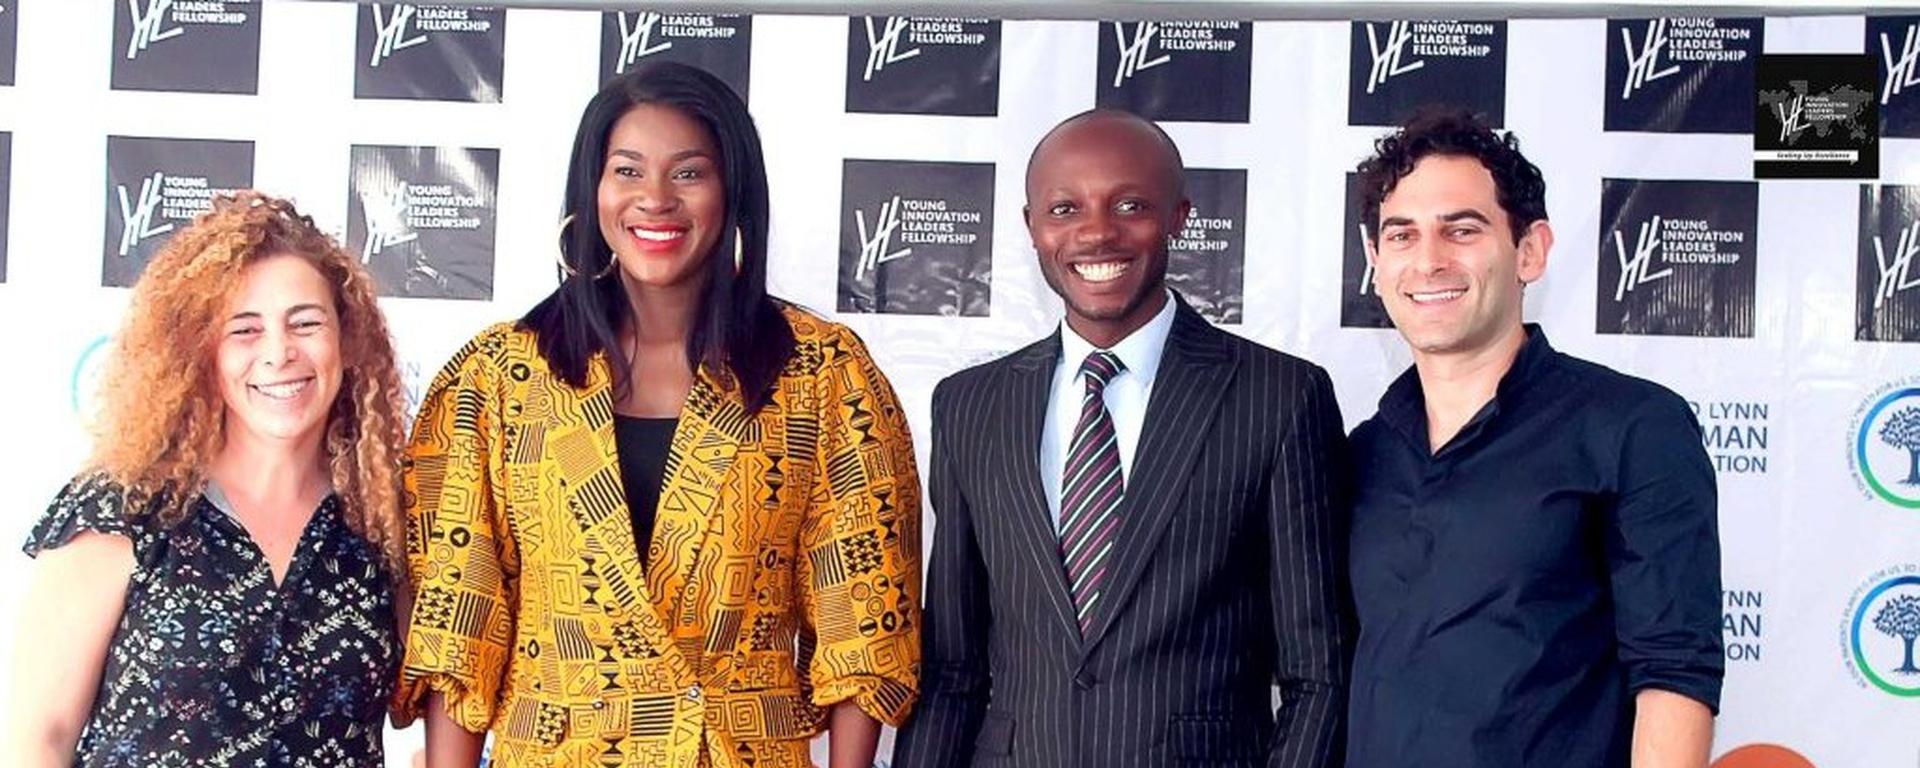 Young Innovation Leaders - Young Innovation Leaders Fellowship Programme Movemeback African initiative cover image